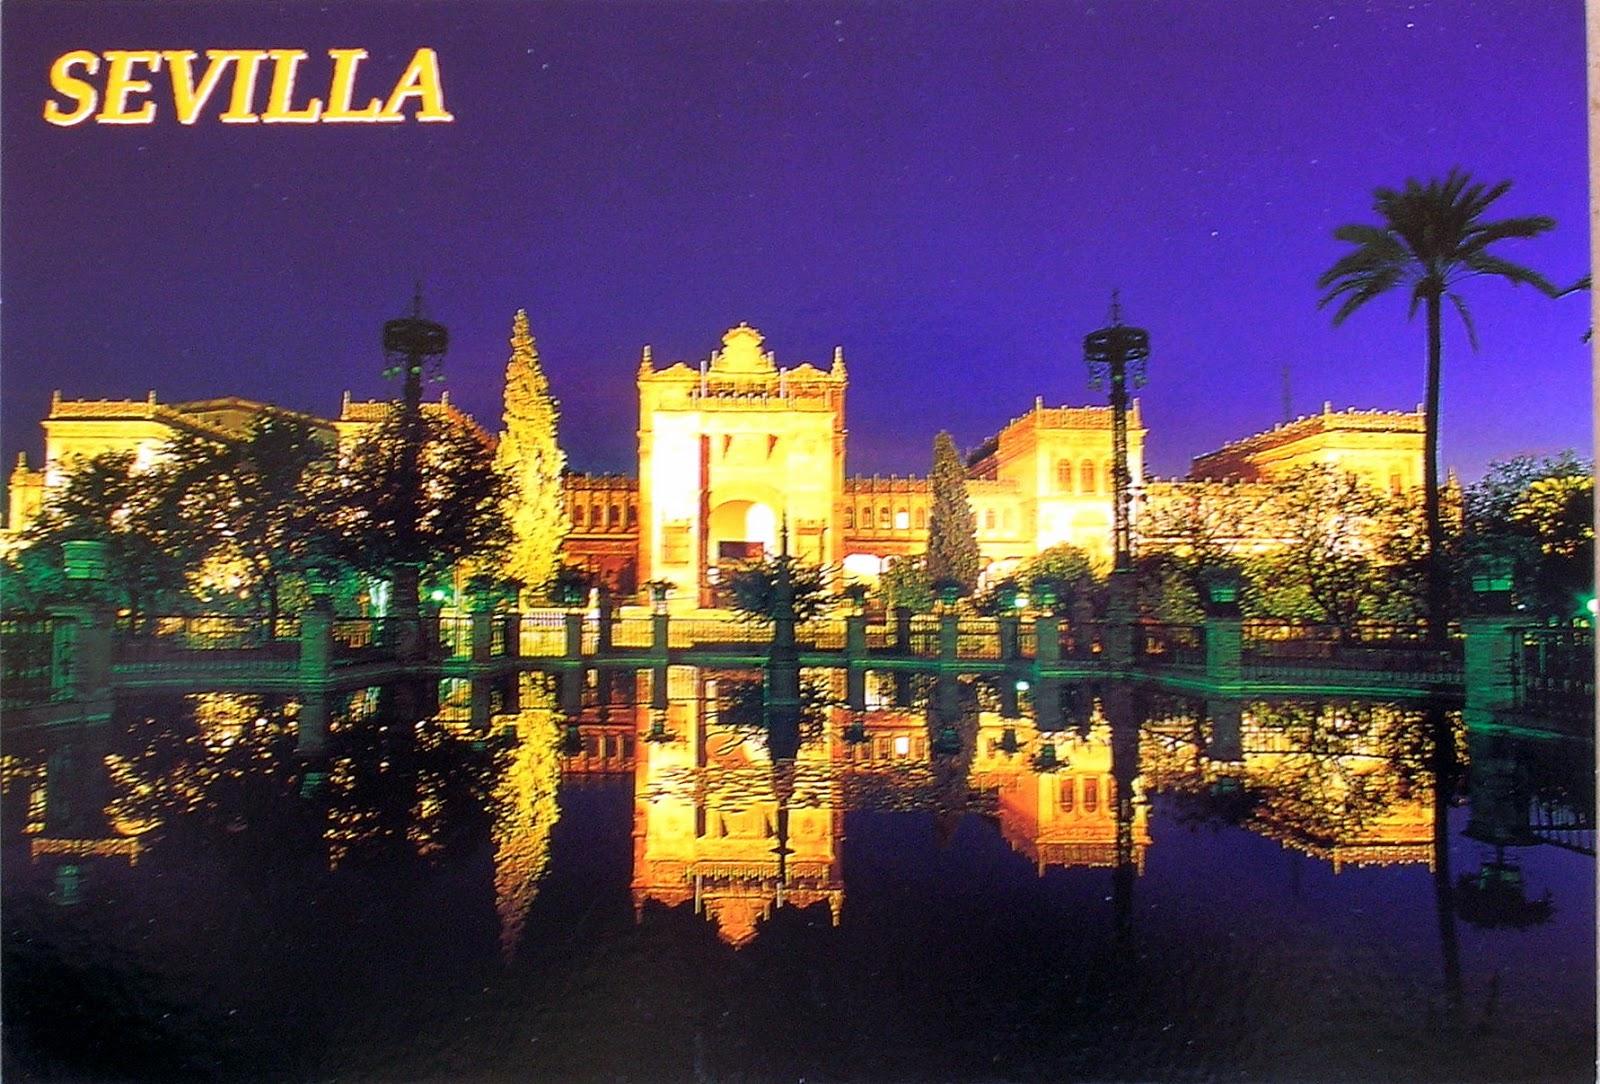 carte postale seville